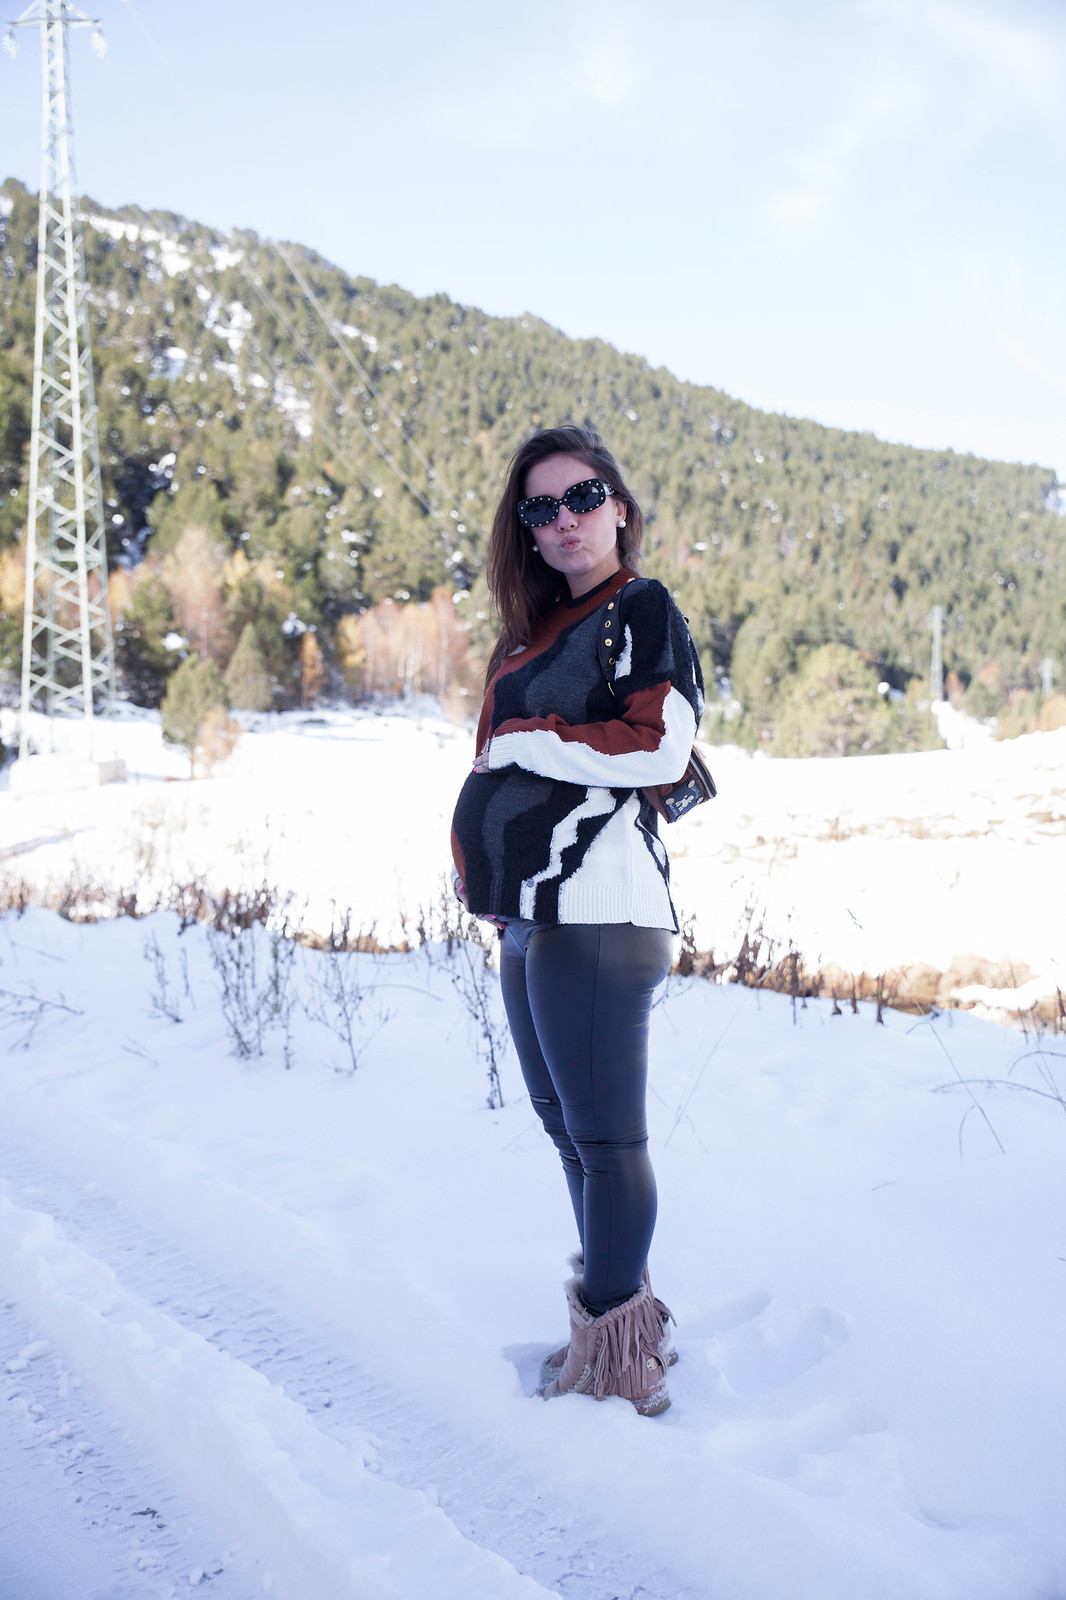 02_combinar_jersey_marron_outfit_nieve_embarazada_theguestgirl_embarazo_33semanas_pregnant_style_influencer_barcelona